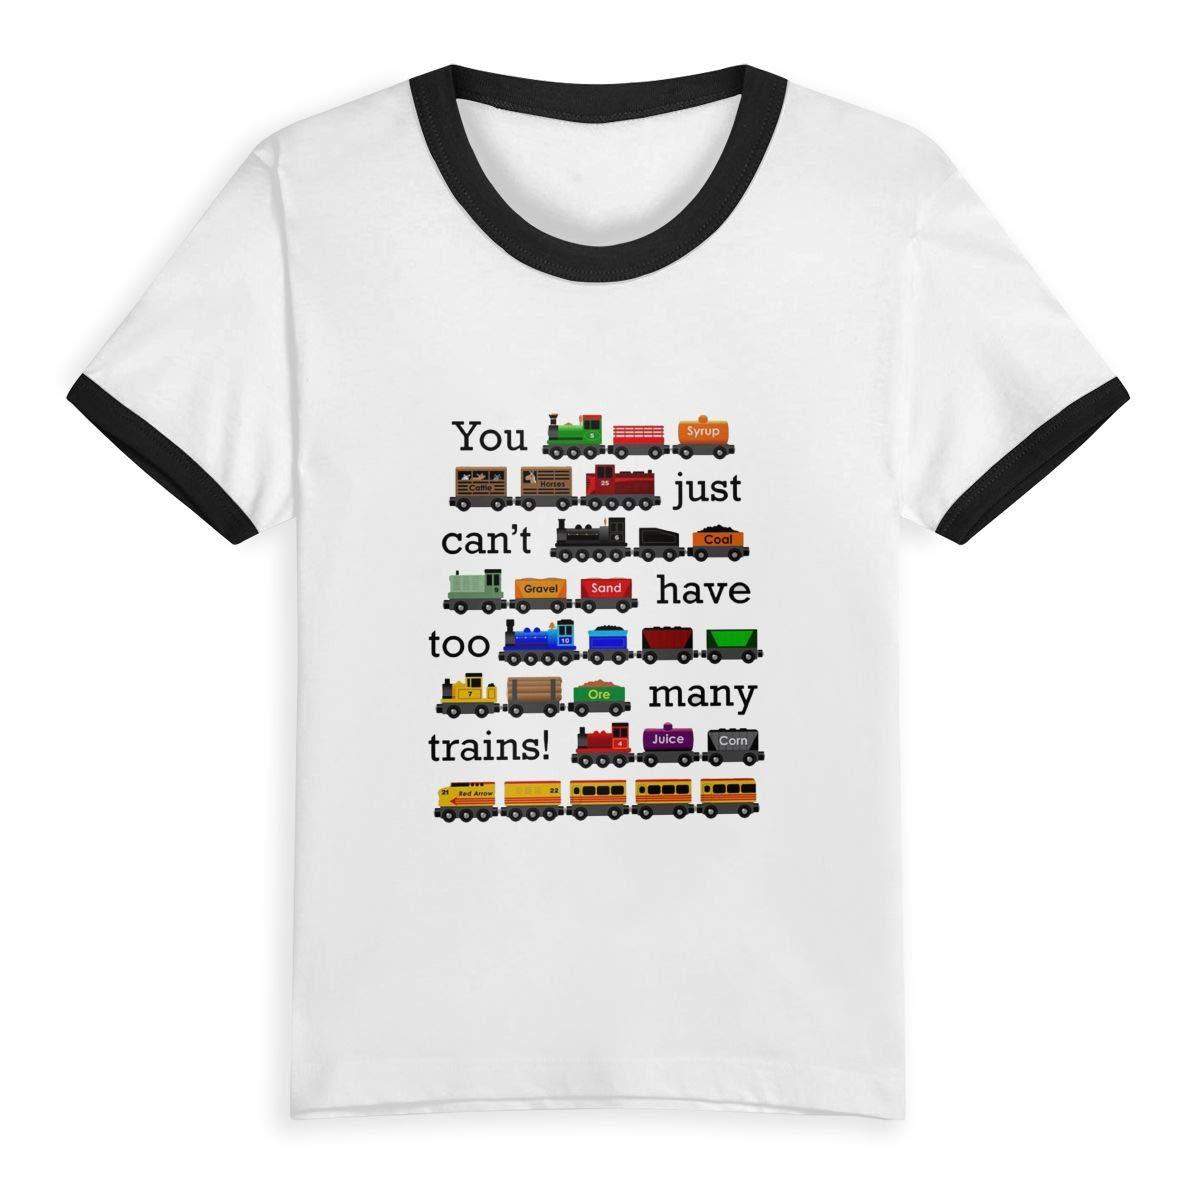 Many Trains Unisex Youths Short Sleeve T-Shirt Kids T-Shirt Tops